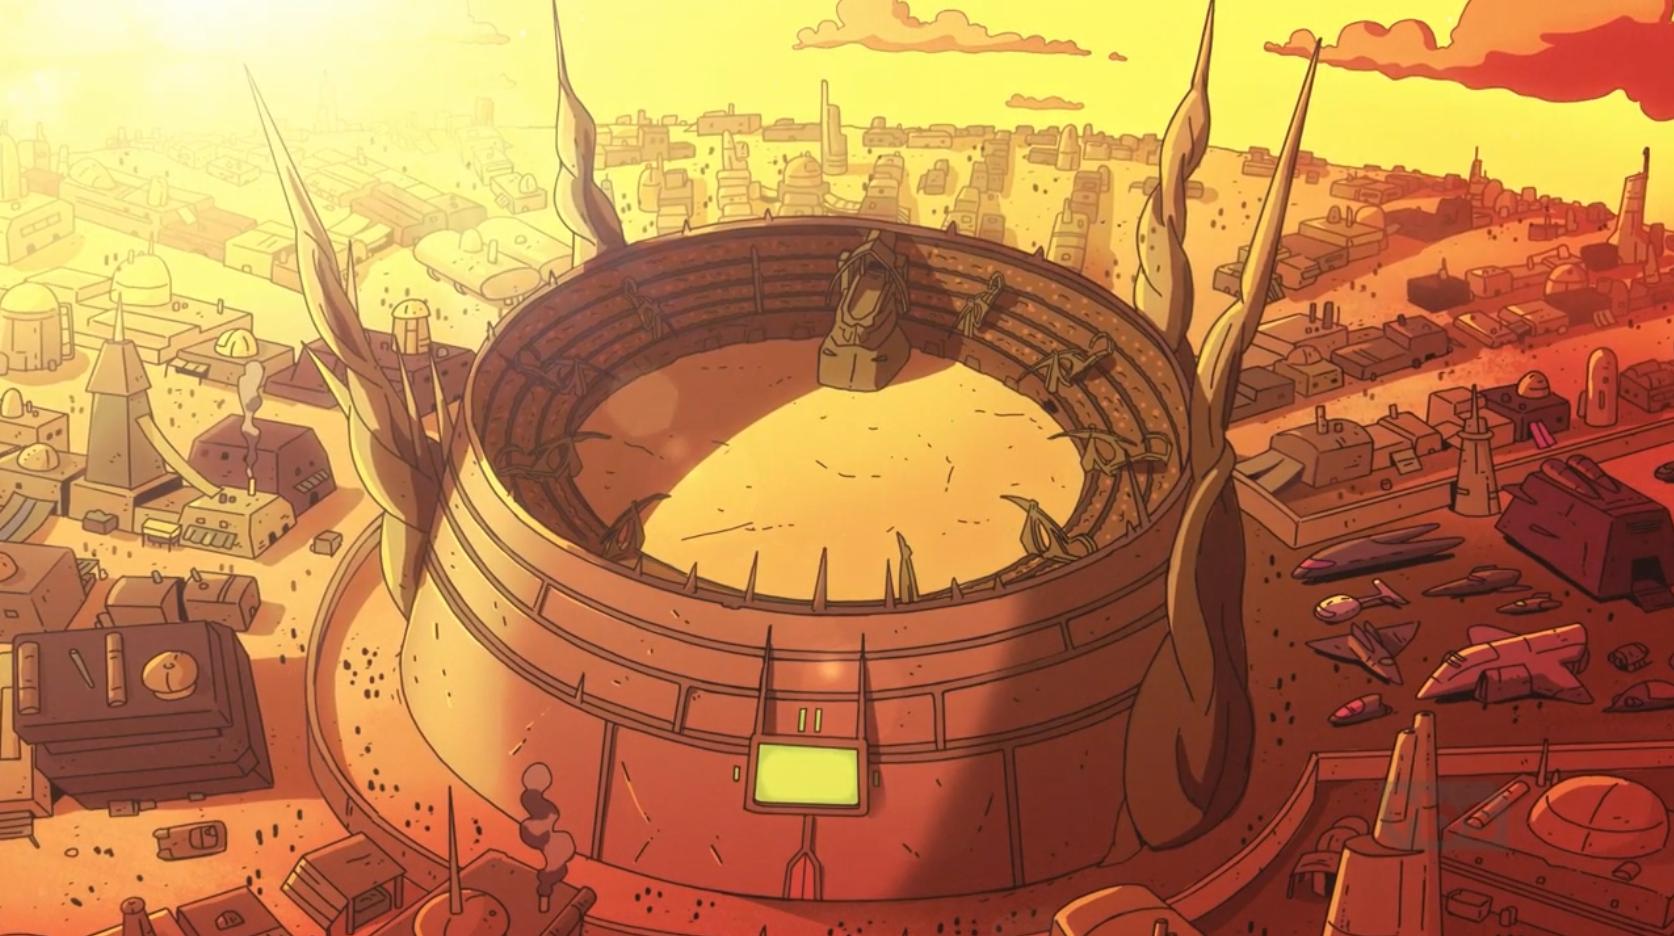 Deathcropolis